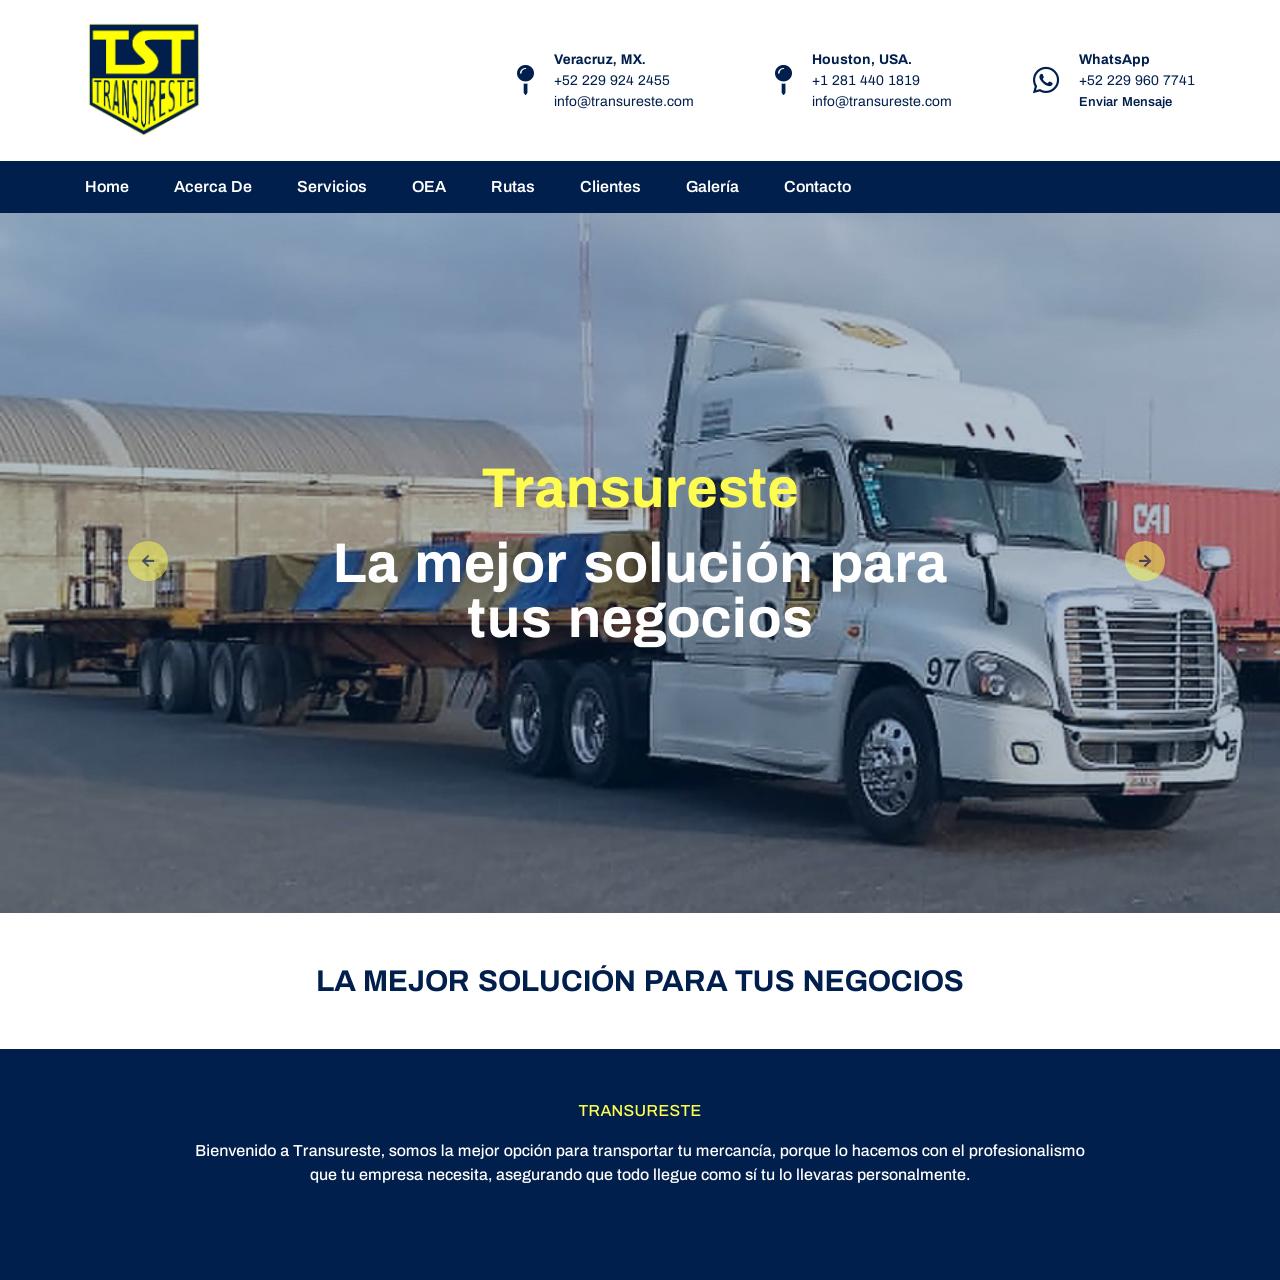 www.transureste.com